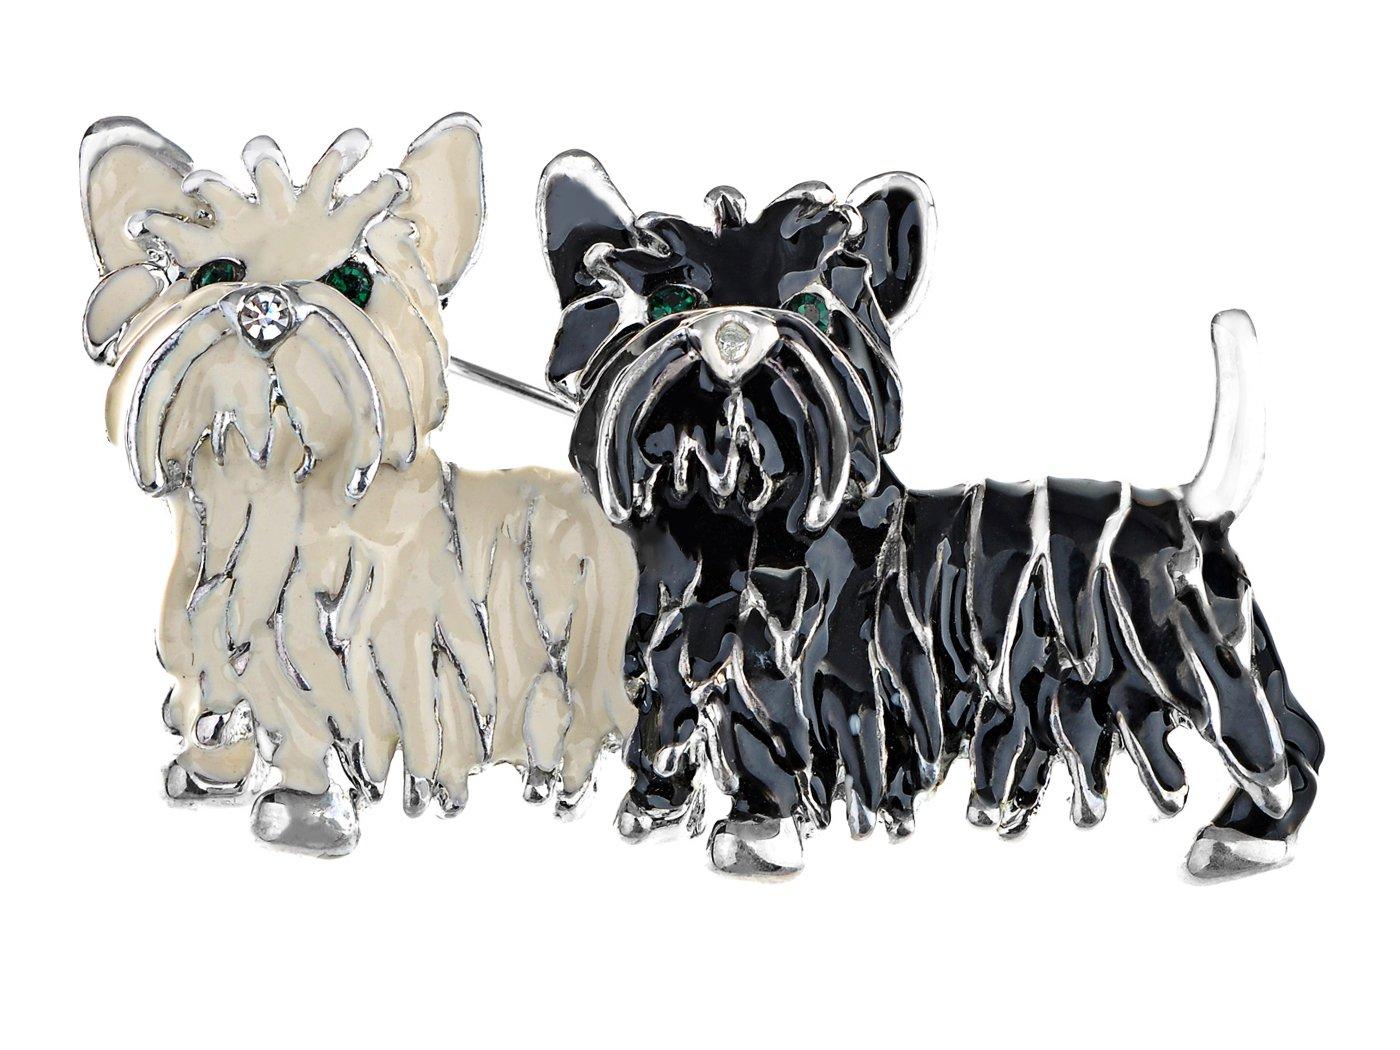 Alilang Cute Black White Shih Tzu Terrier Dog Puppy Love Enamel Cartoon Furry Animal Brooch Pin